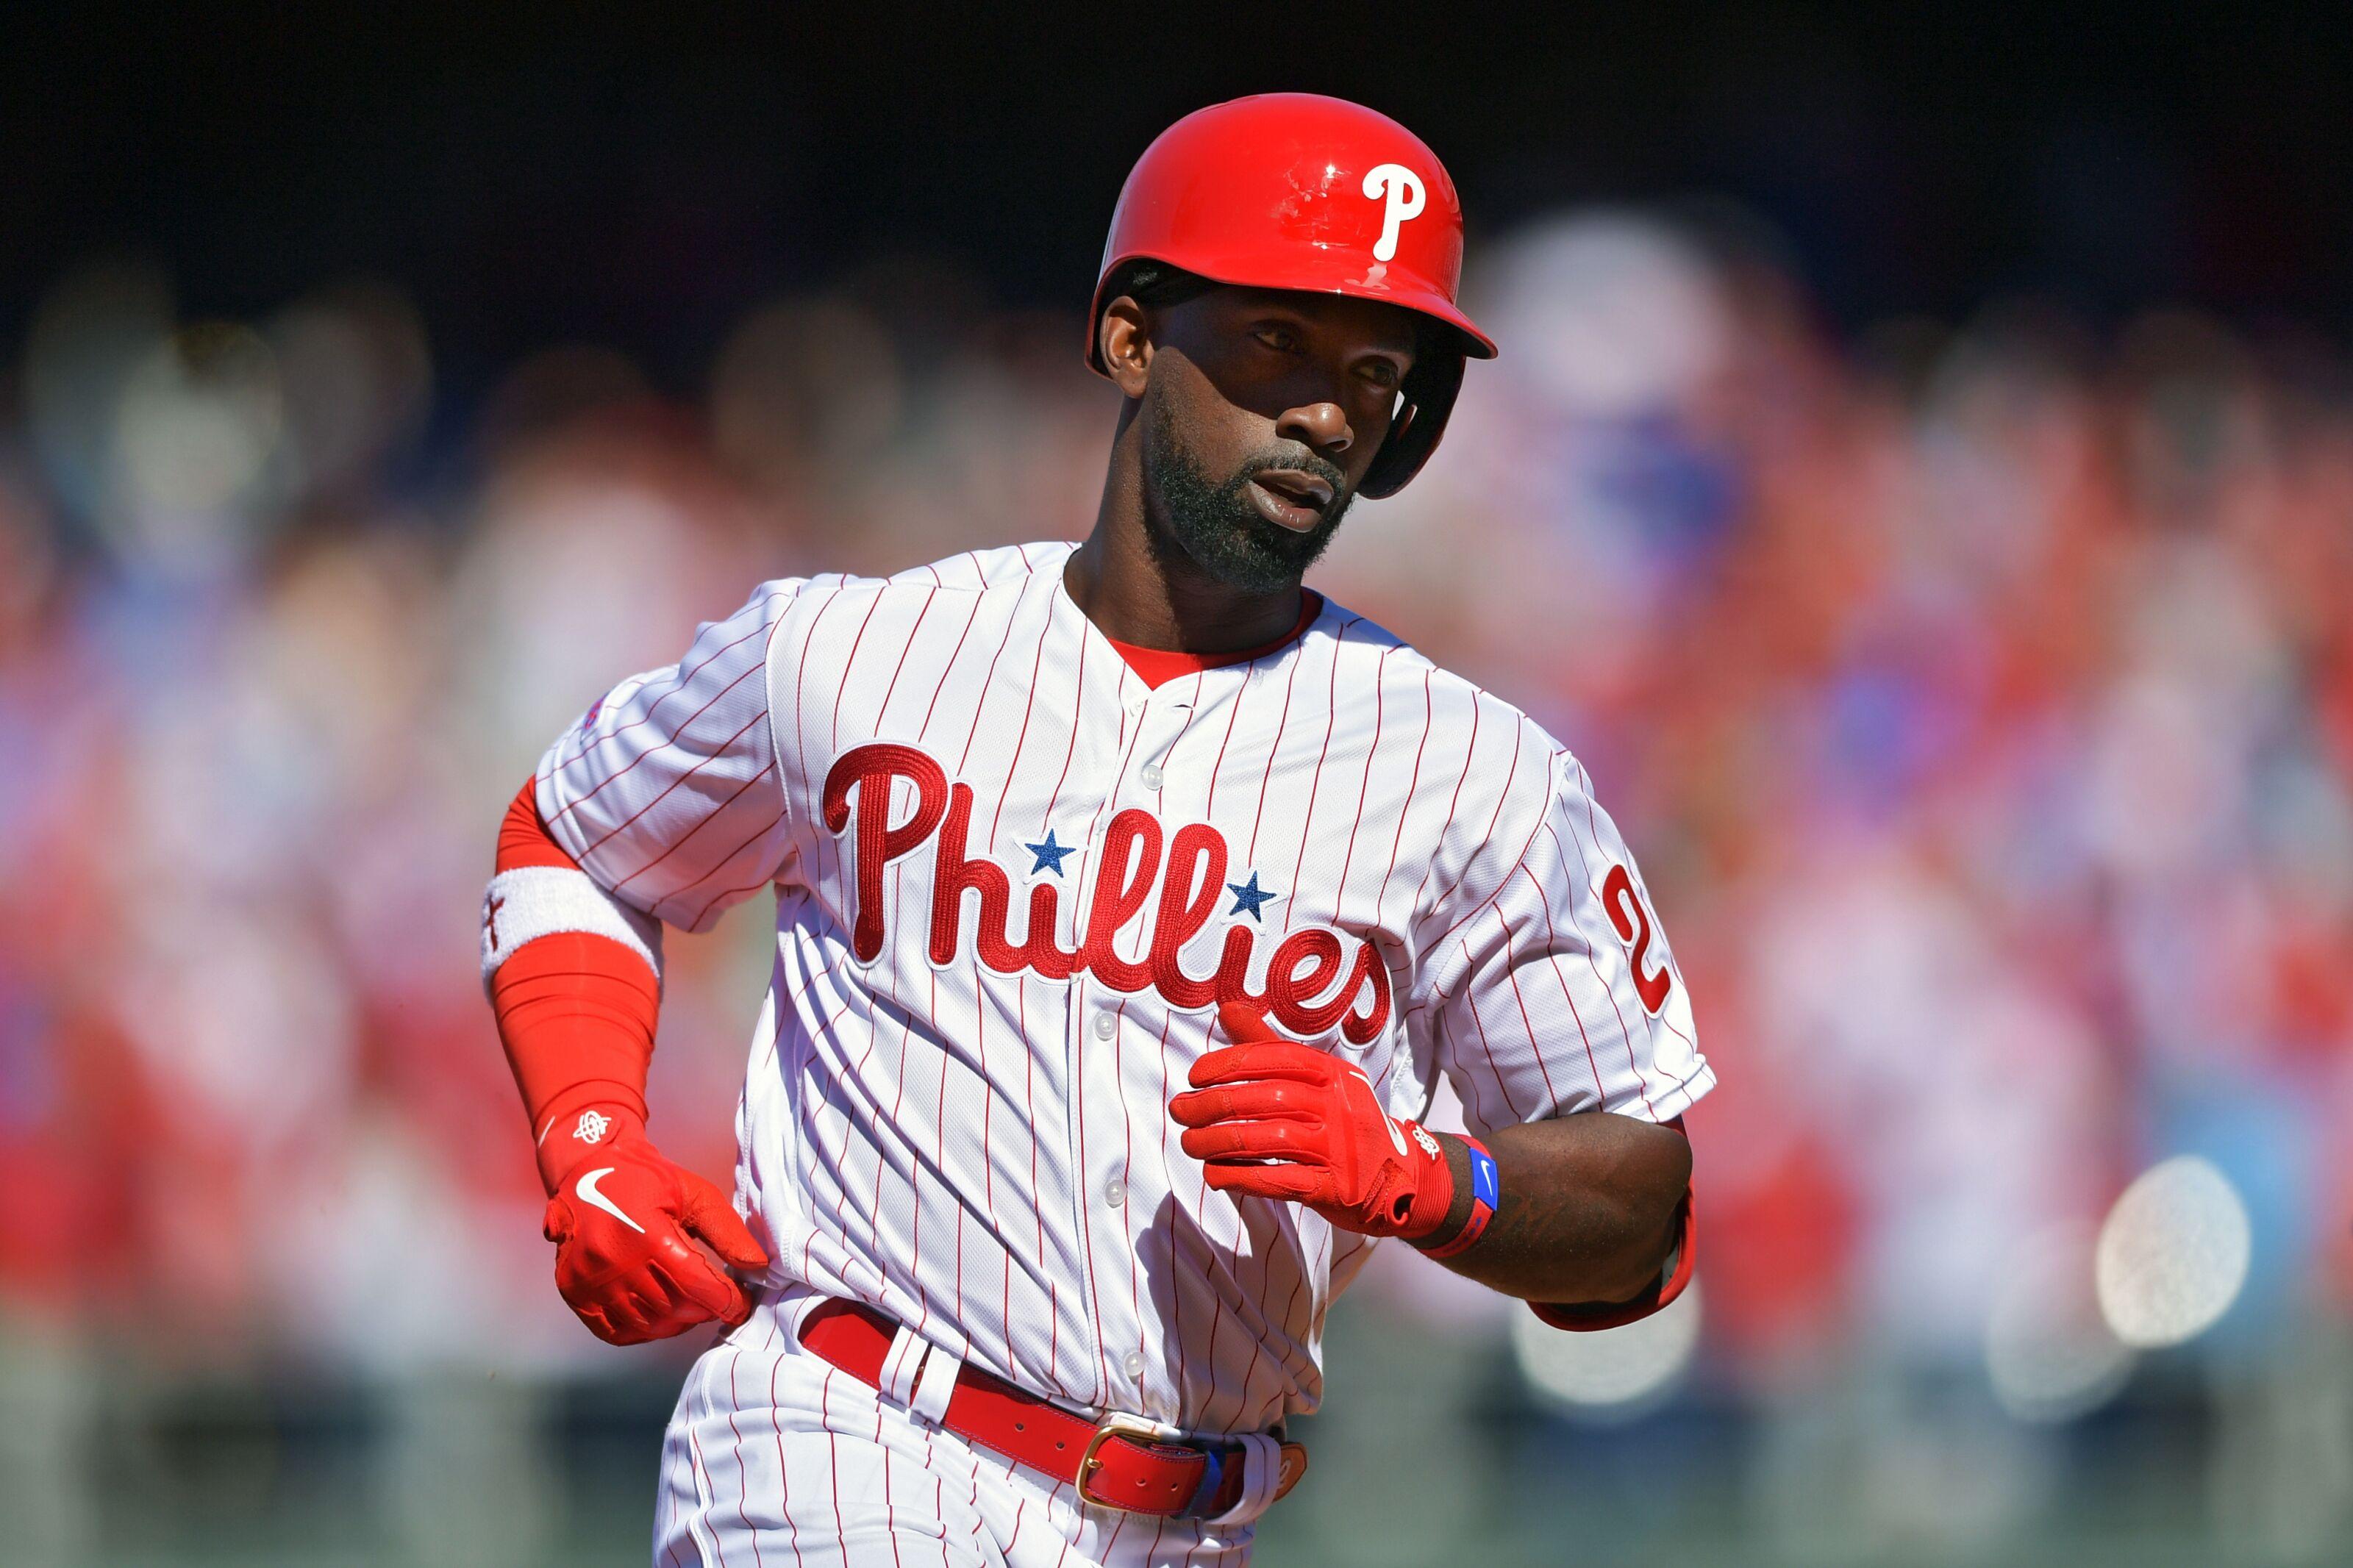 100% authentic 4967f a9ba2 Philadelphia Phillies: Andrew McCutchen hits home run first ...